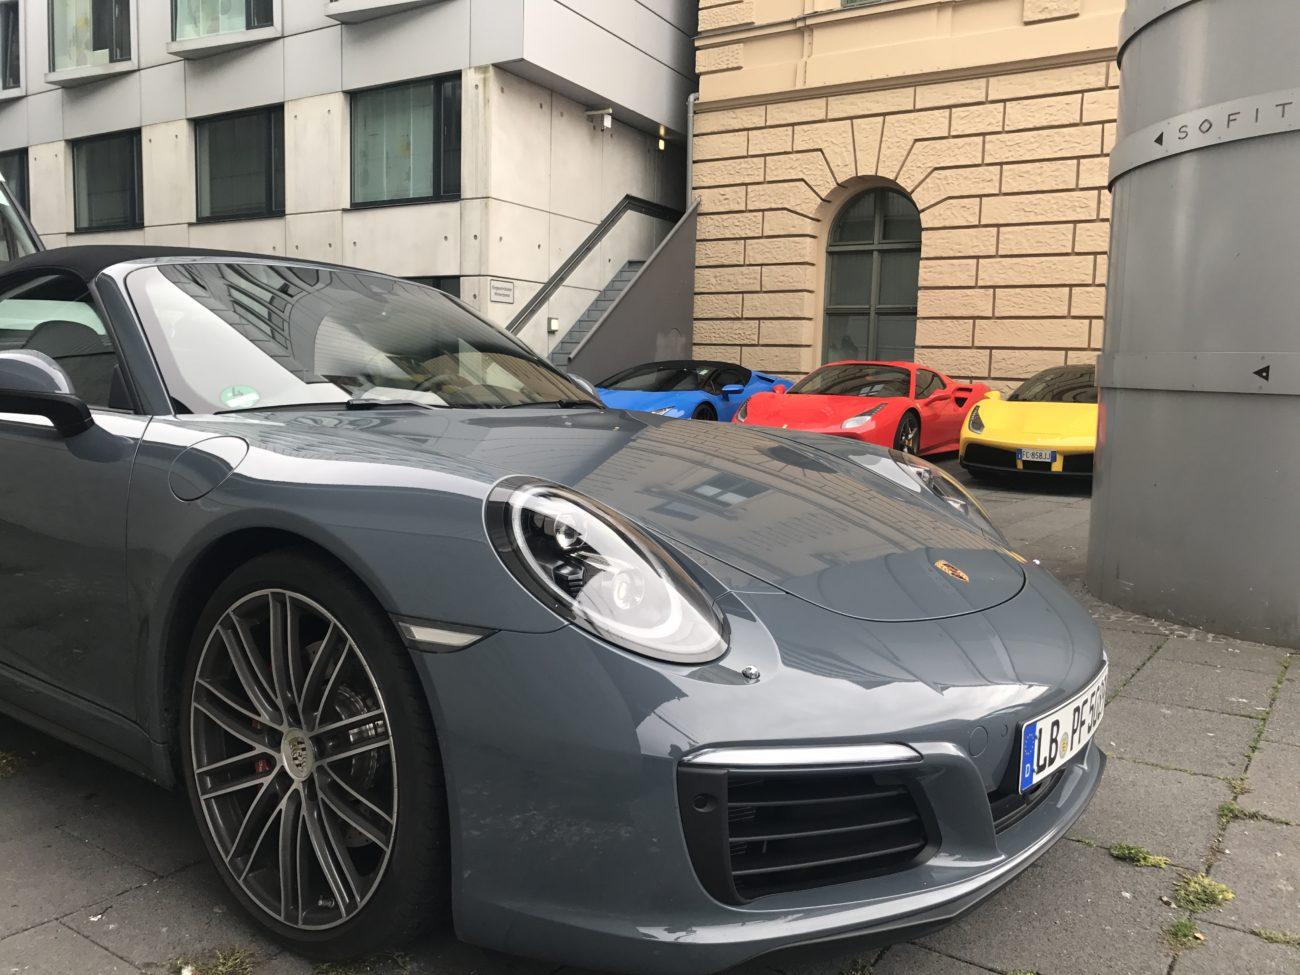 2017 Porsche 911 Carrera S4 Cab Arne's Antics Adventure Drive AD.04